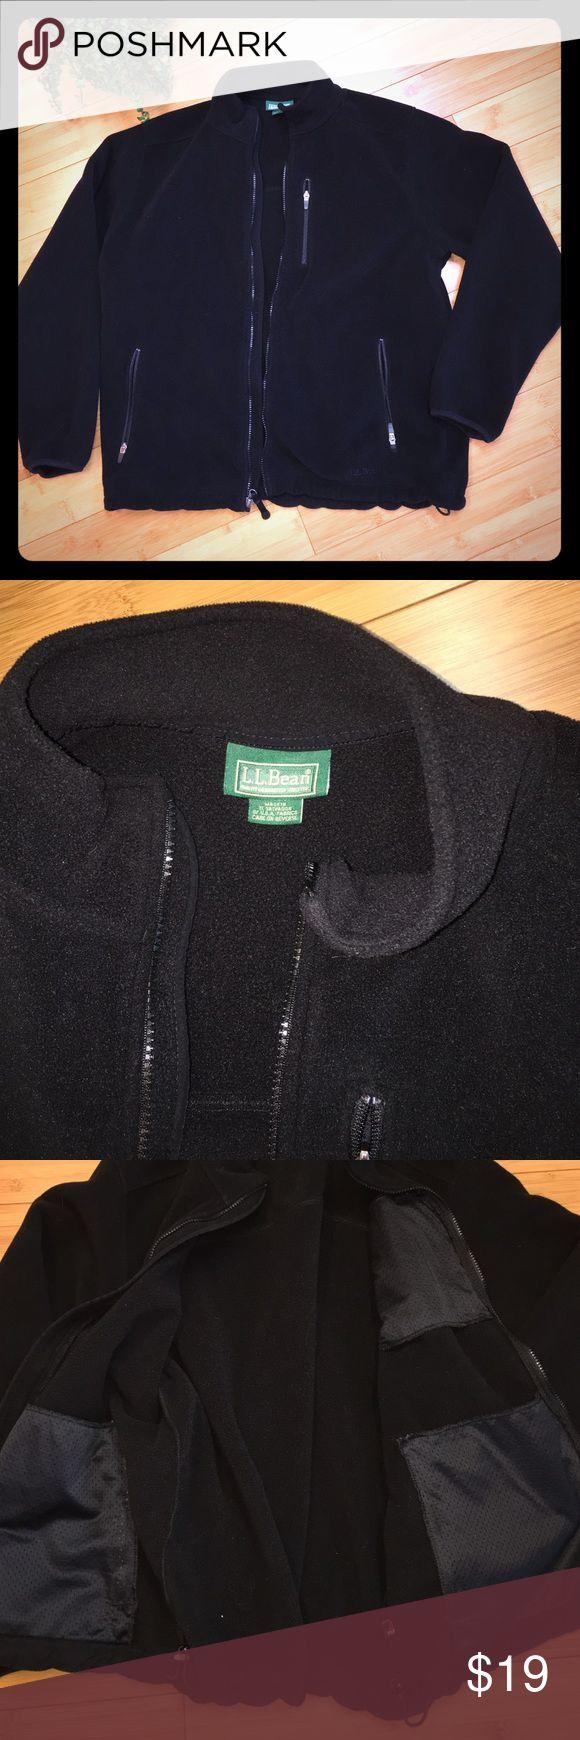 LL BEAN Men's Polartech Fleece Zip Up Jacket Very warm, barely used fleece jacket. Drawstrings at waist. L.L. Bean Jackets & Coats